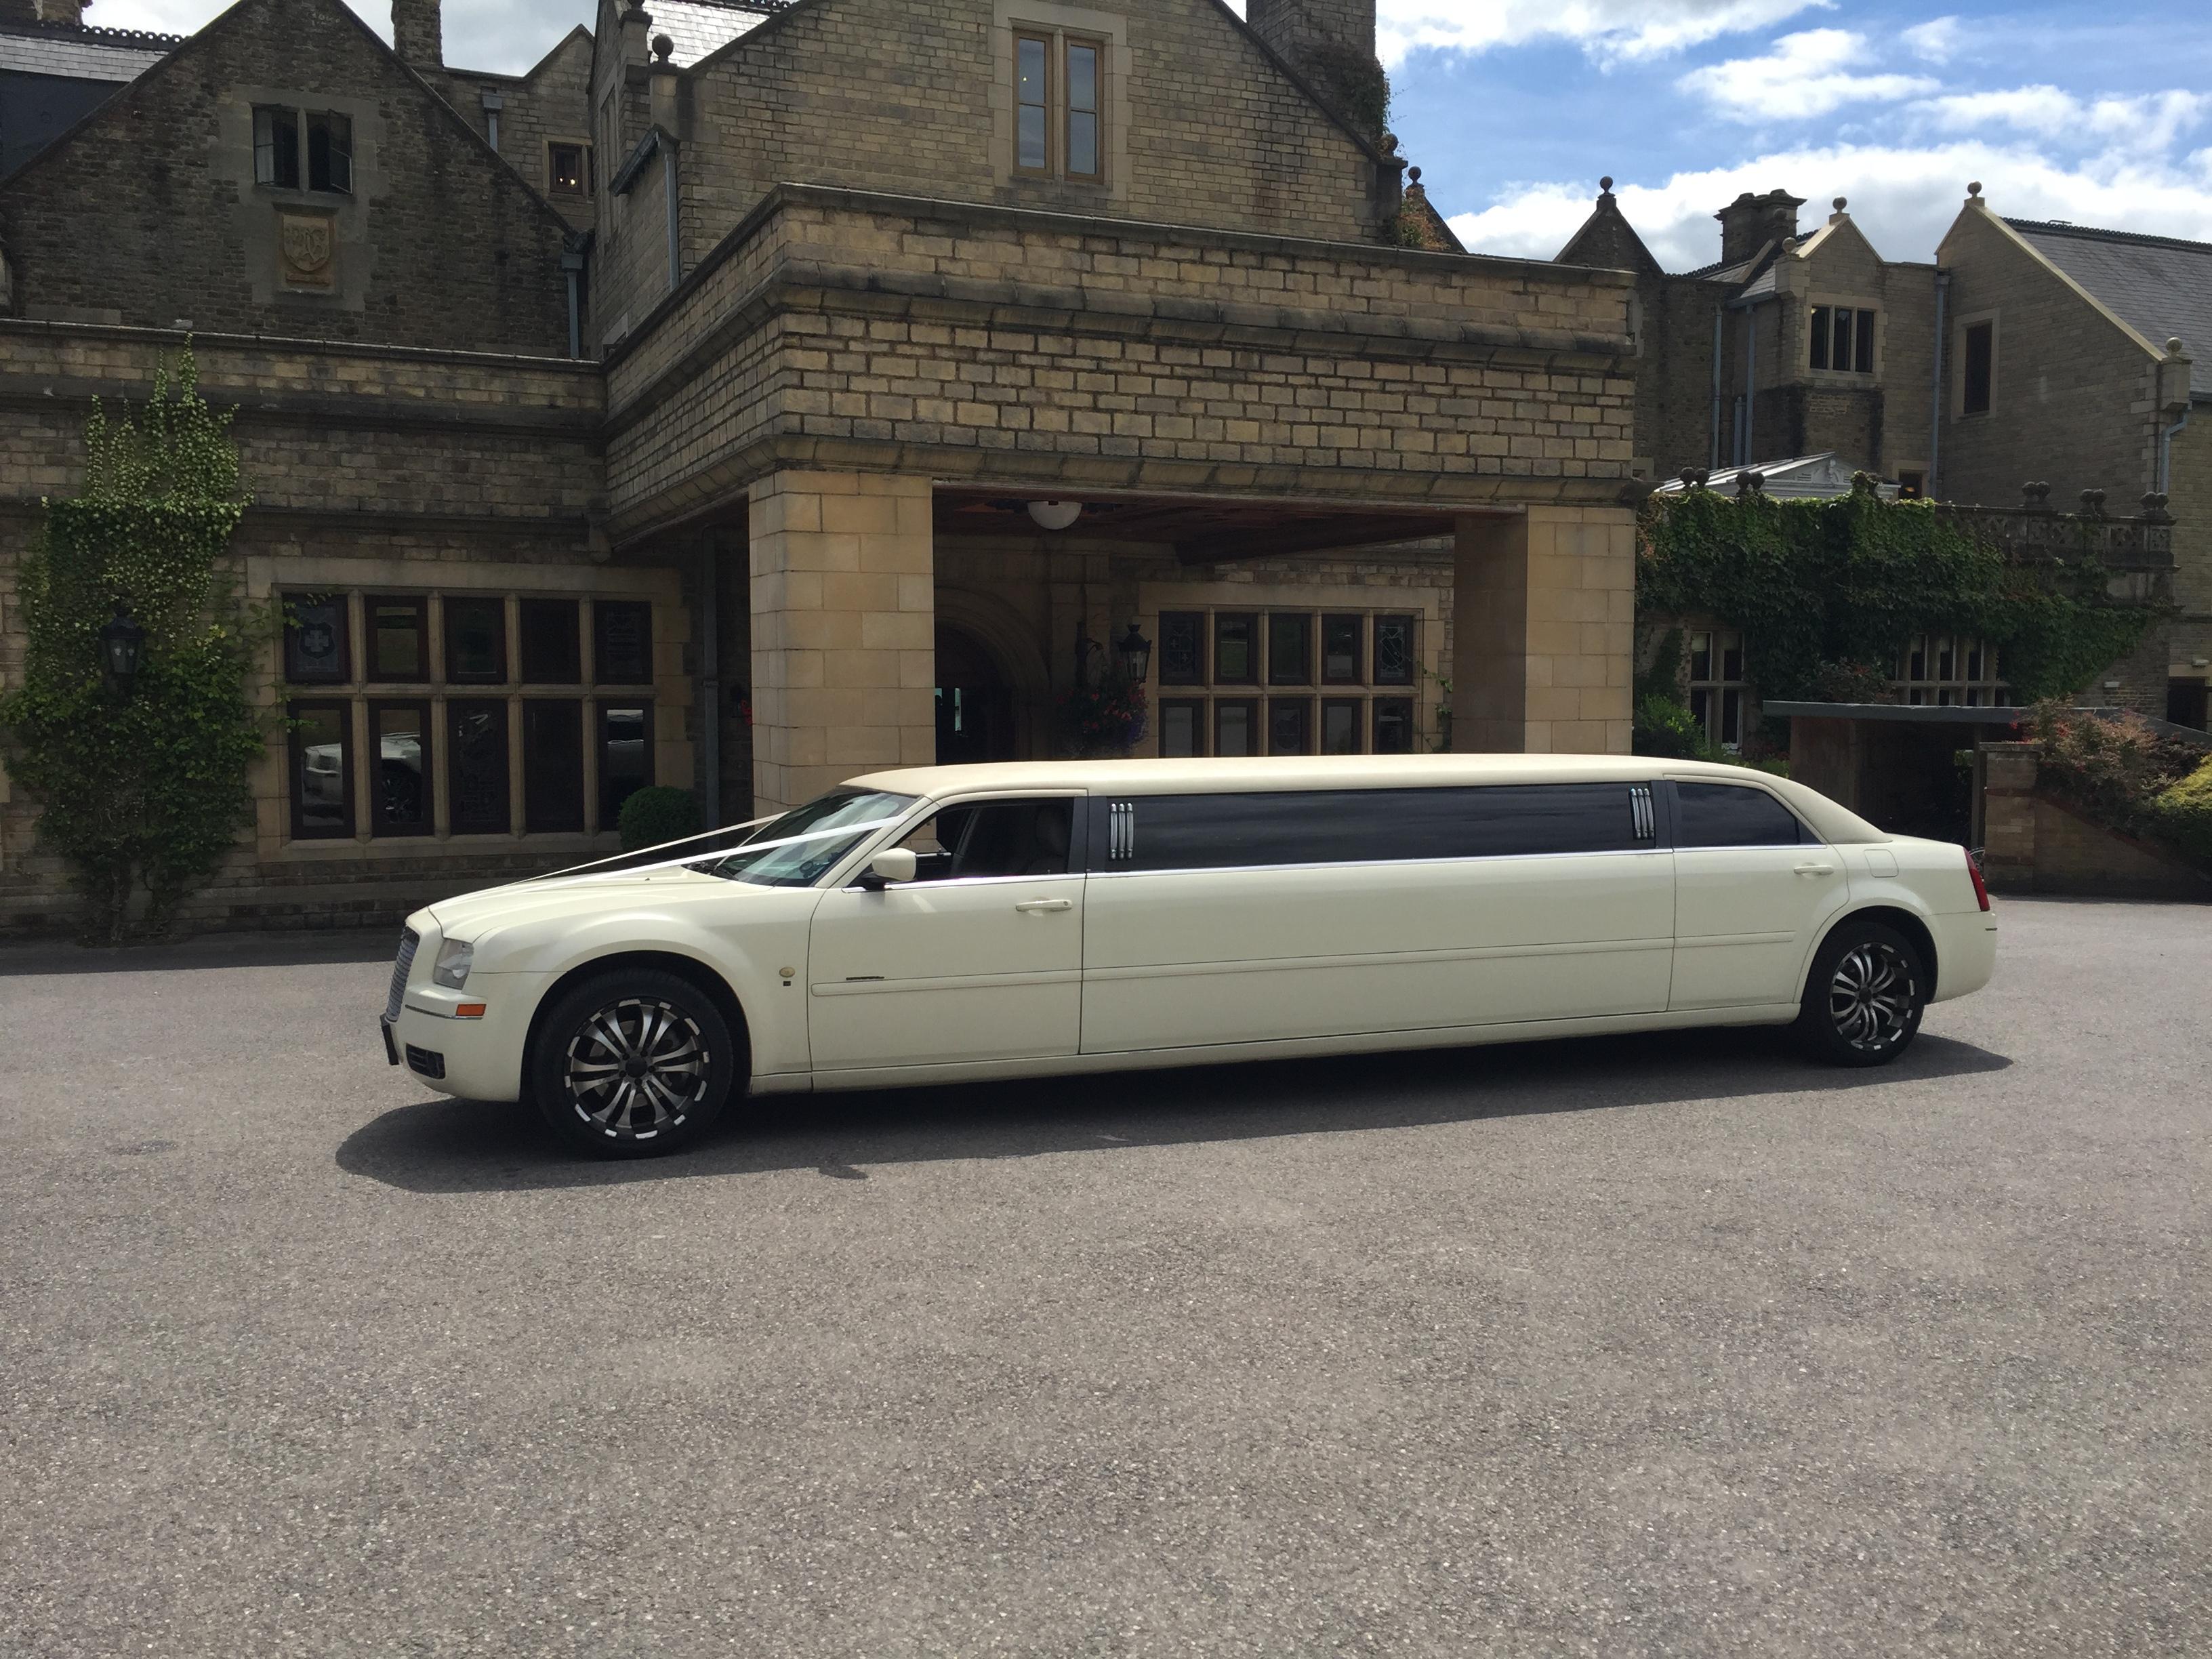 Surrey Cars Guildford Reviews